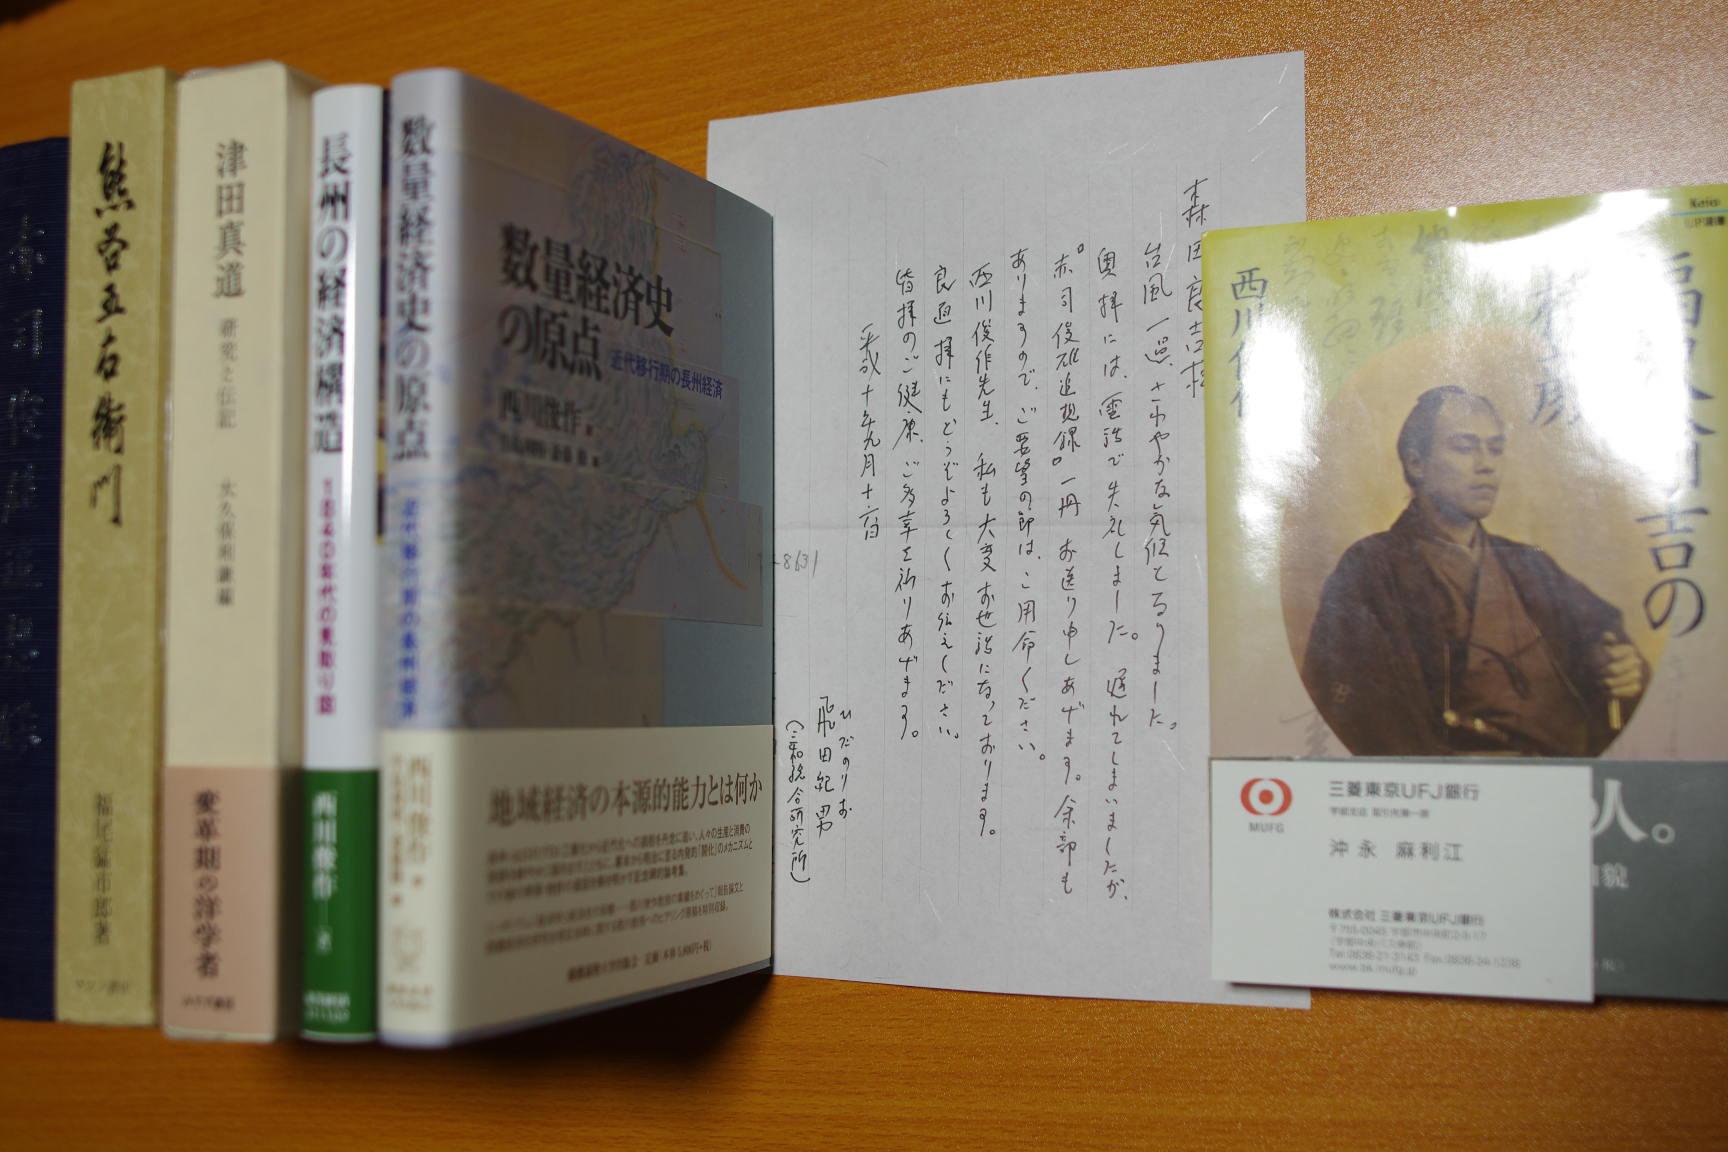 山口県の東栄信用金|東京都の三菱東京UFJ銀行の窓 …